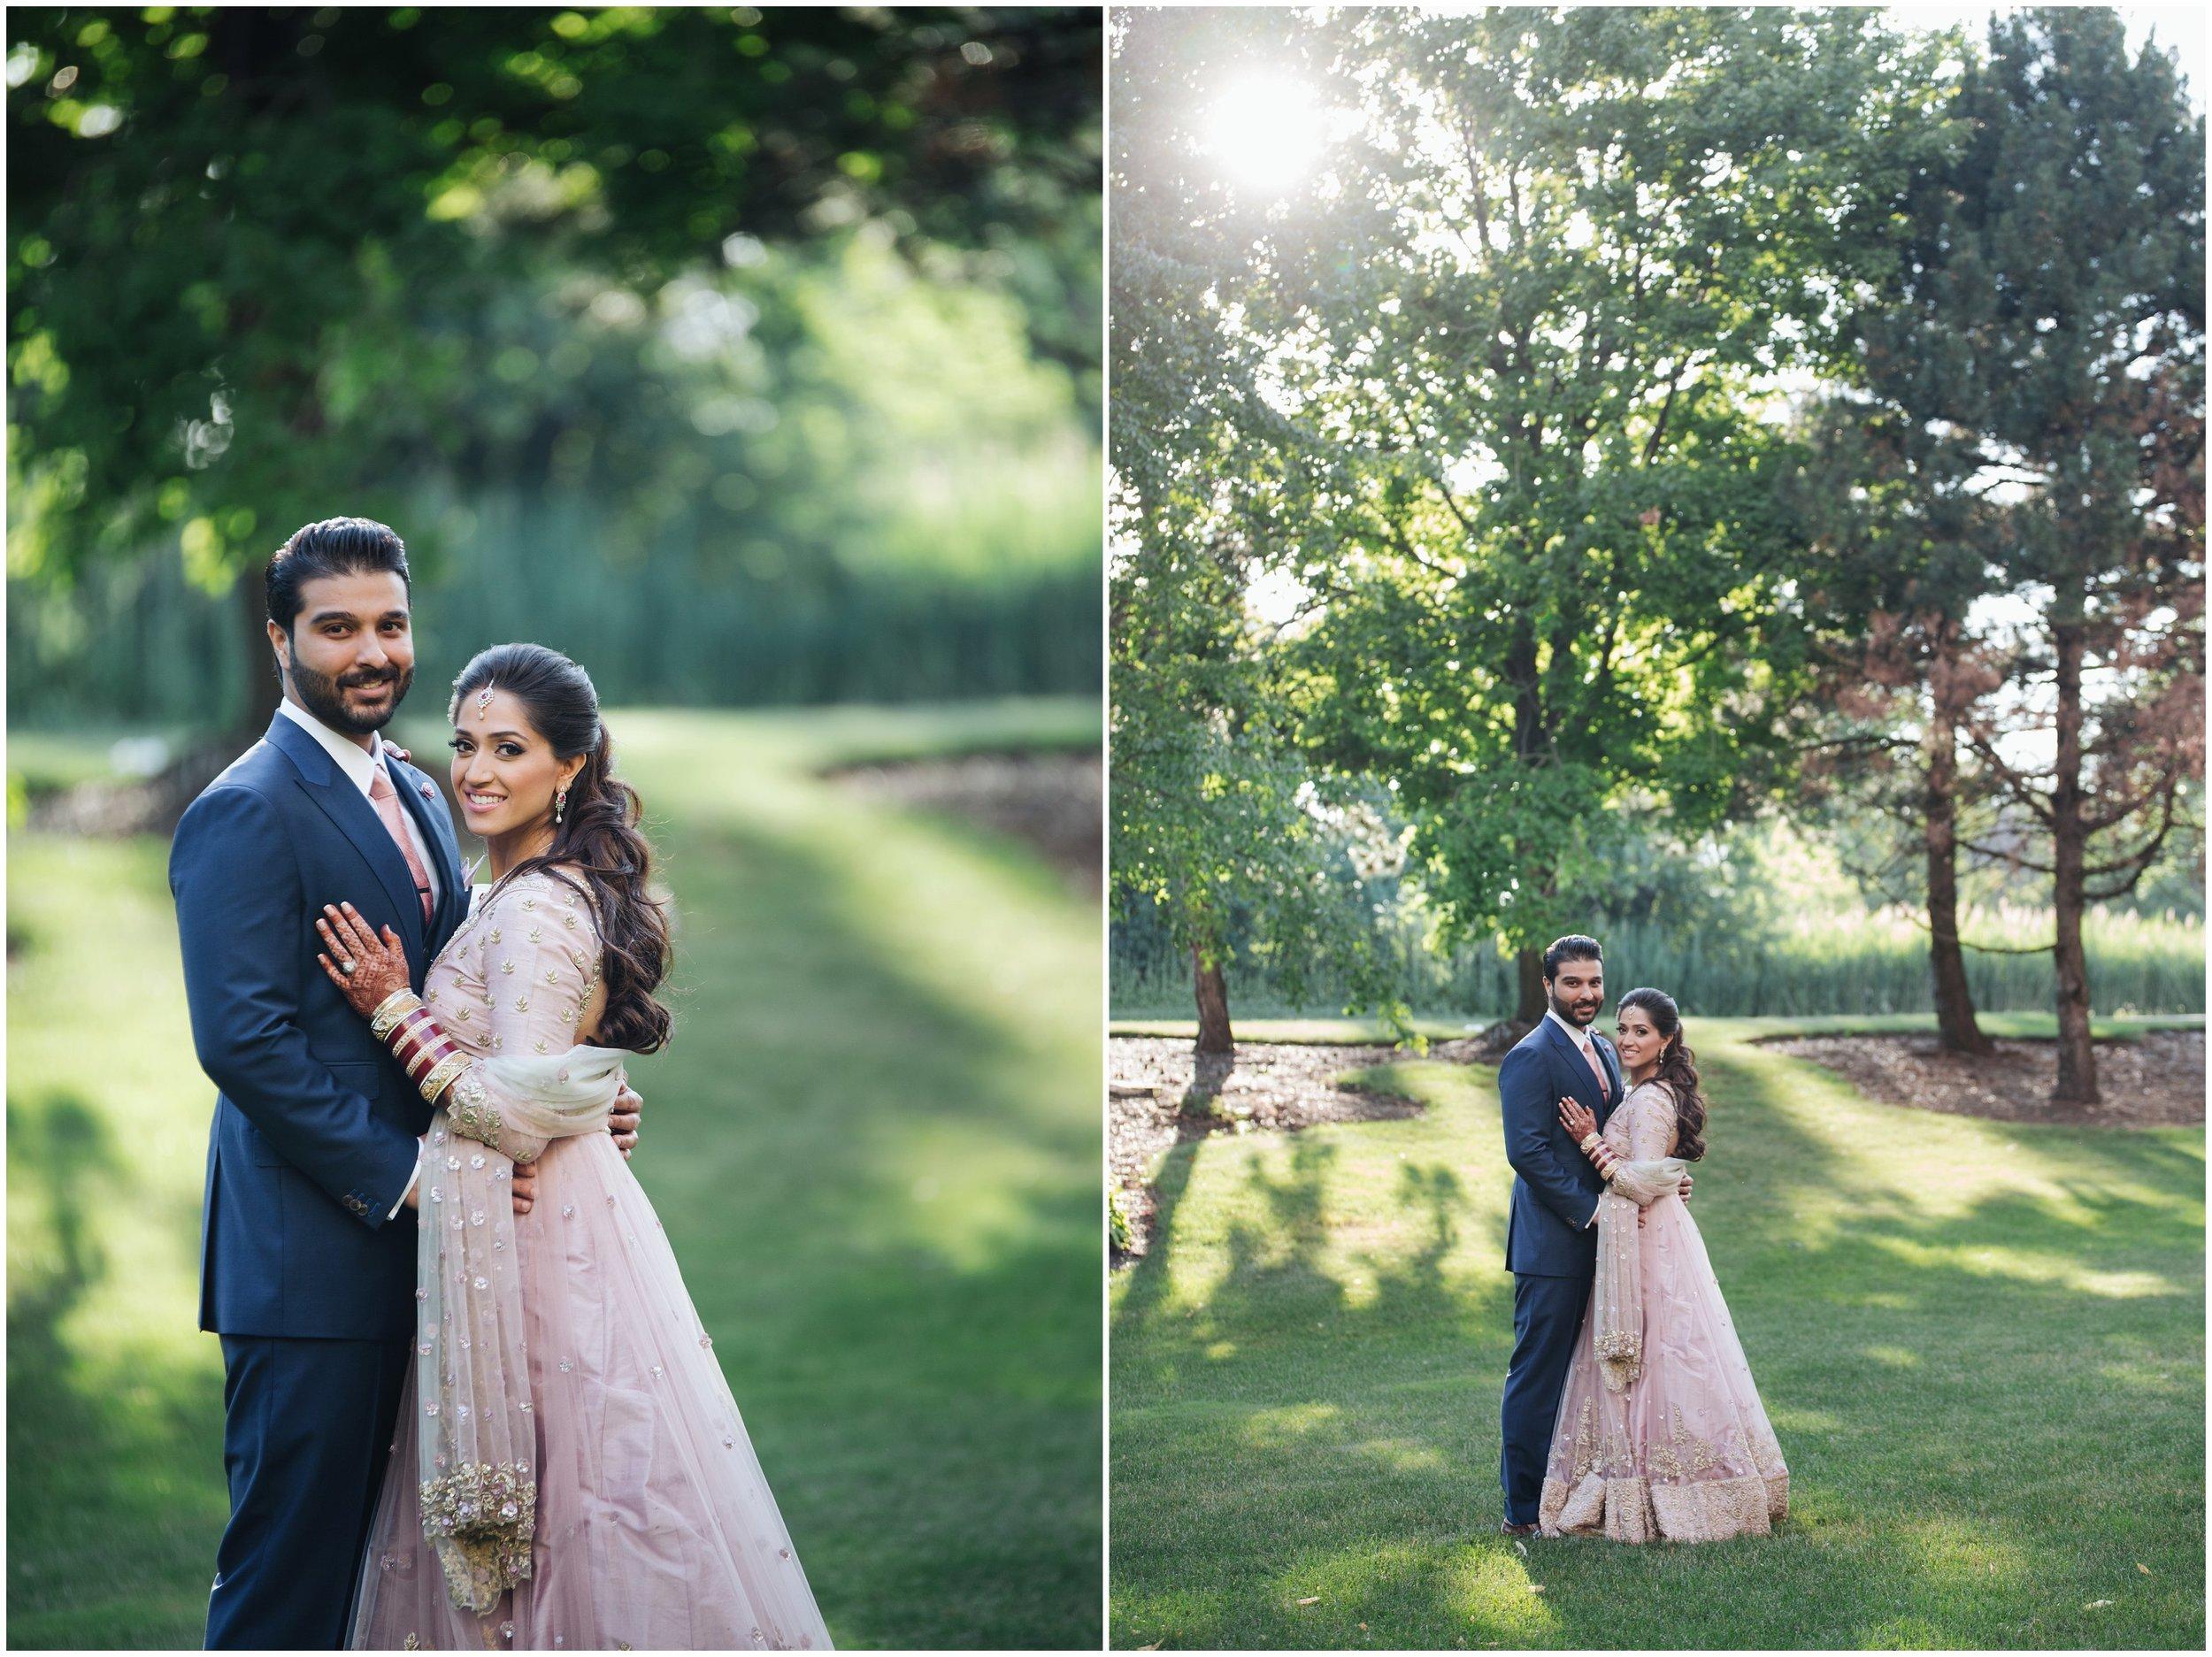 Le Cape Weddings - South Asian Wedding in Illinois - Tanvi and Anshul -1613_LuxuryDestinationPhotographer.jpg